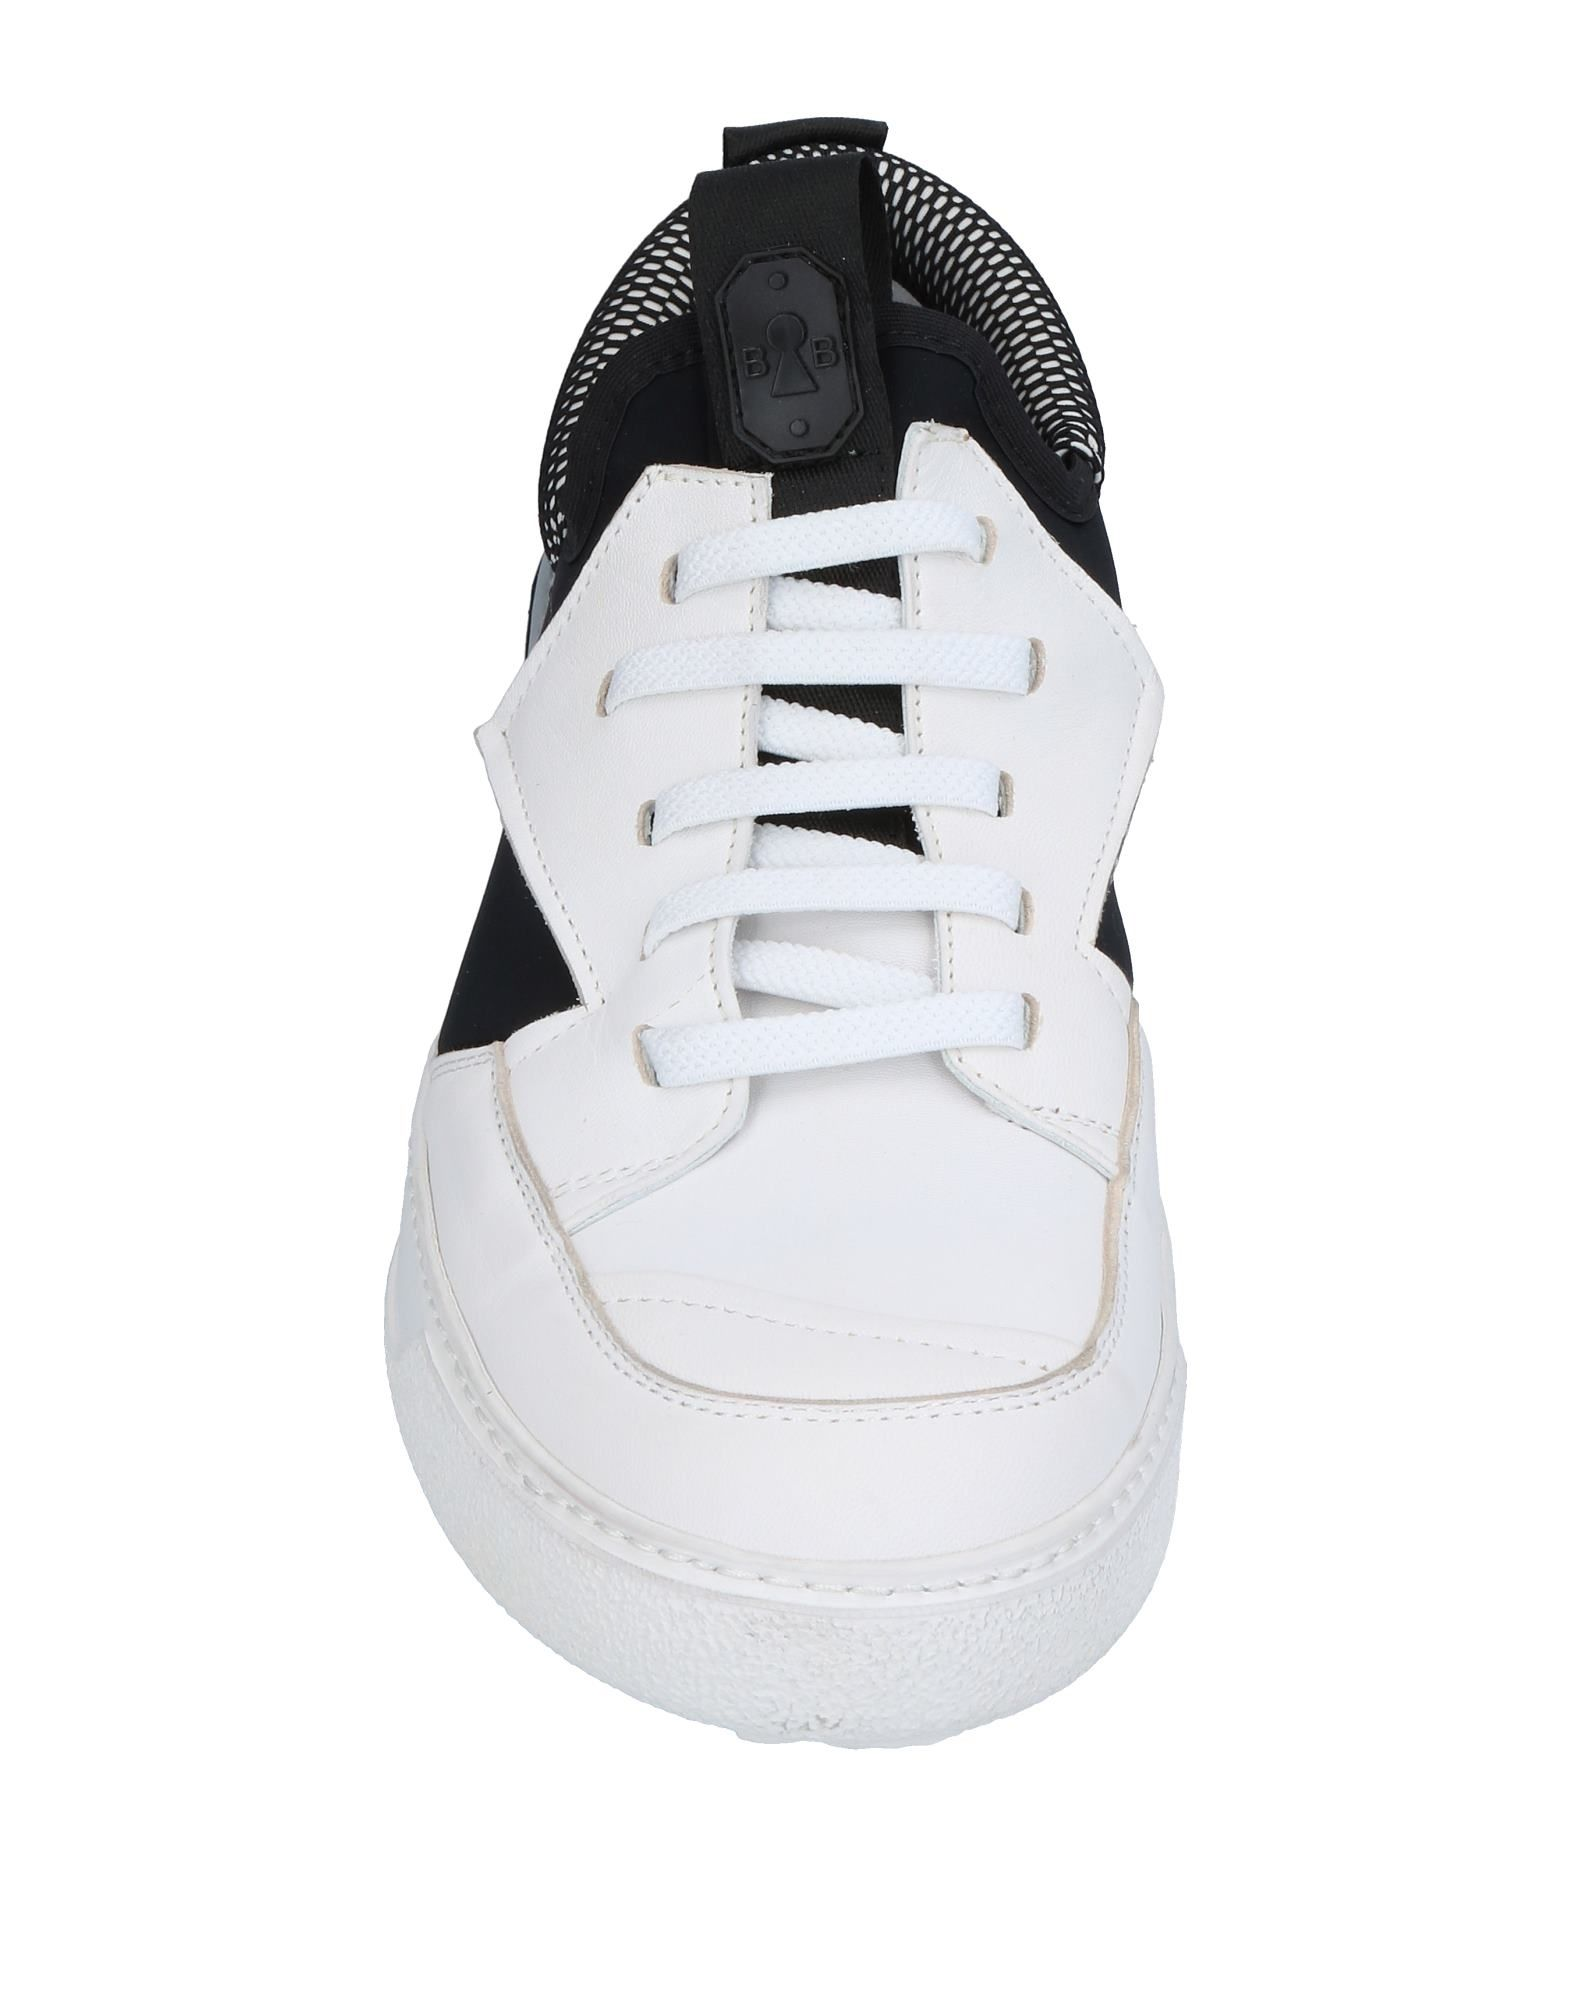 Sneakers Bruno Bordese Homme - Sneakers Bruno Bordese sur